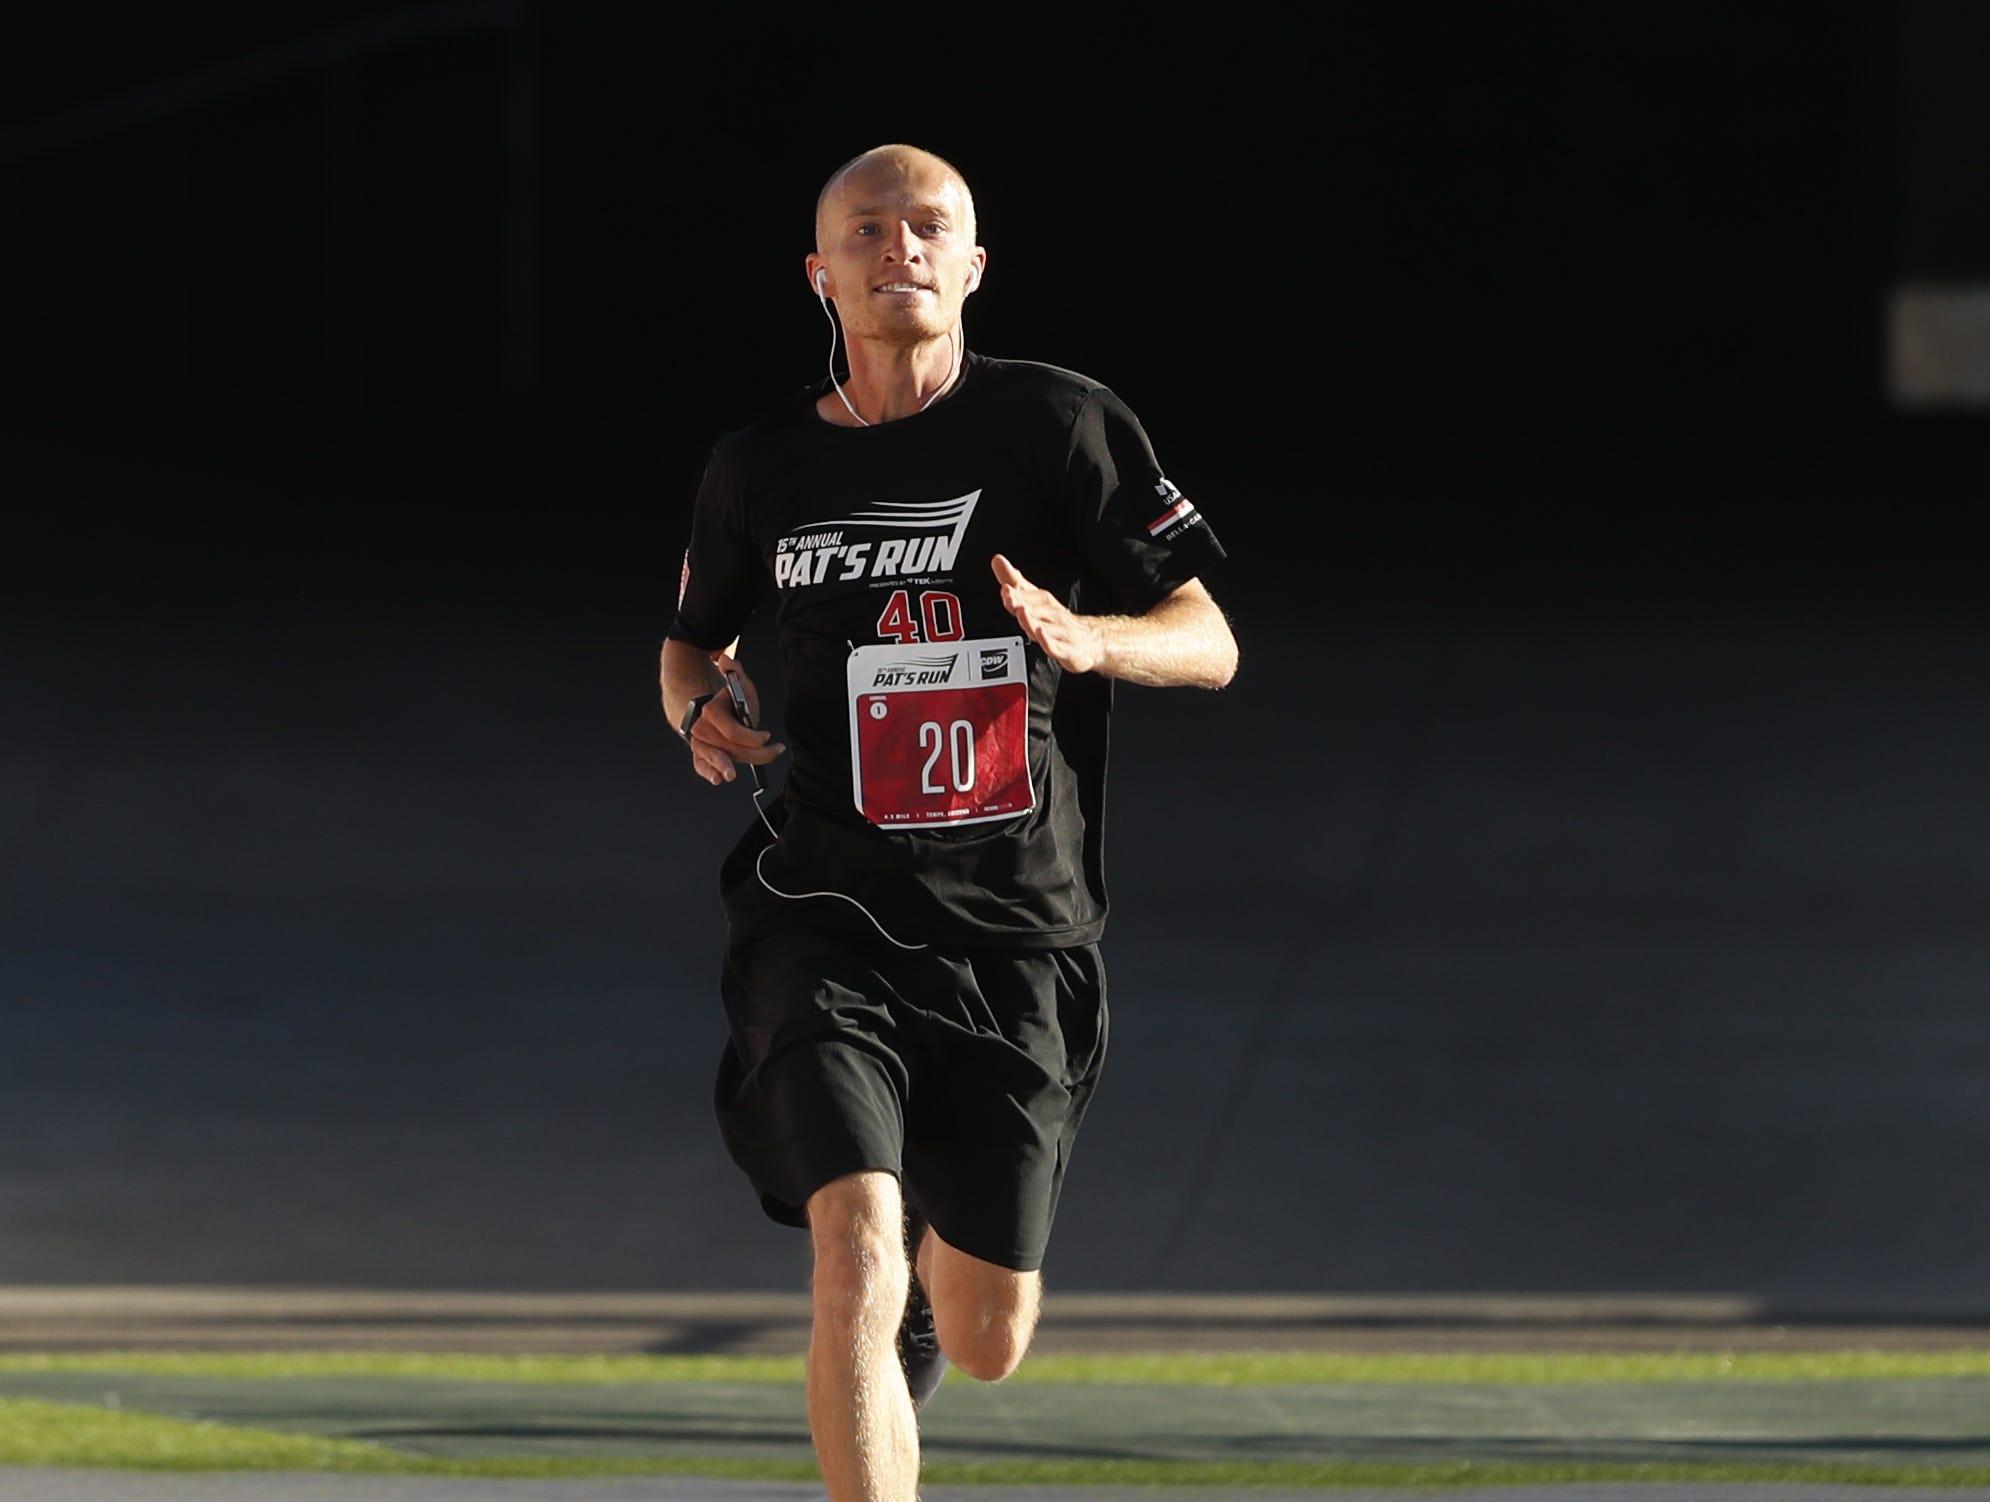 Corey Saunders makes his way down the last stretch inside Sun Devil Stadium during Pat's Run 2019 in Tempe, Ariz. on April 27, 2019.